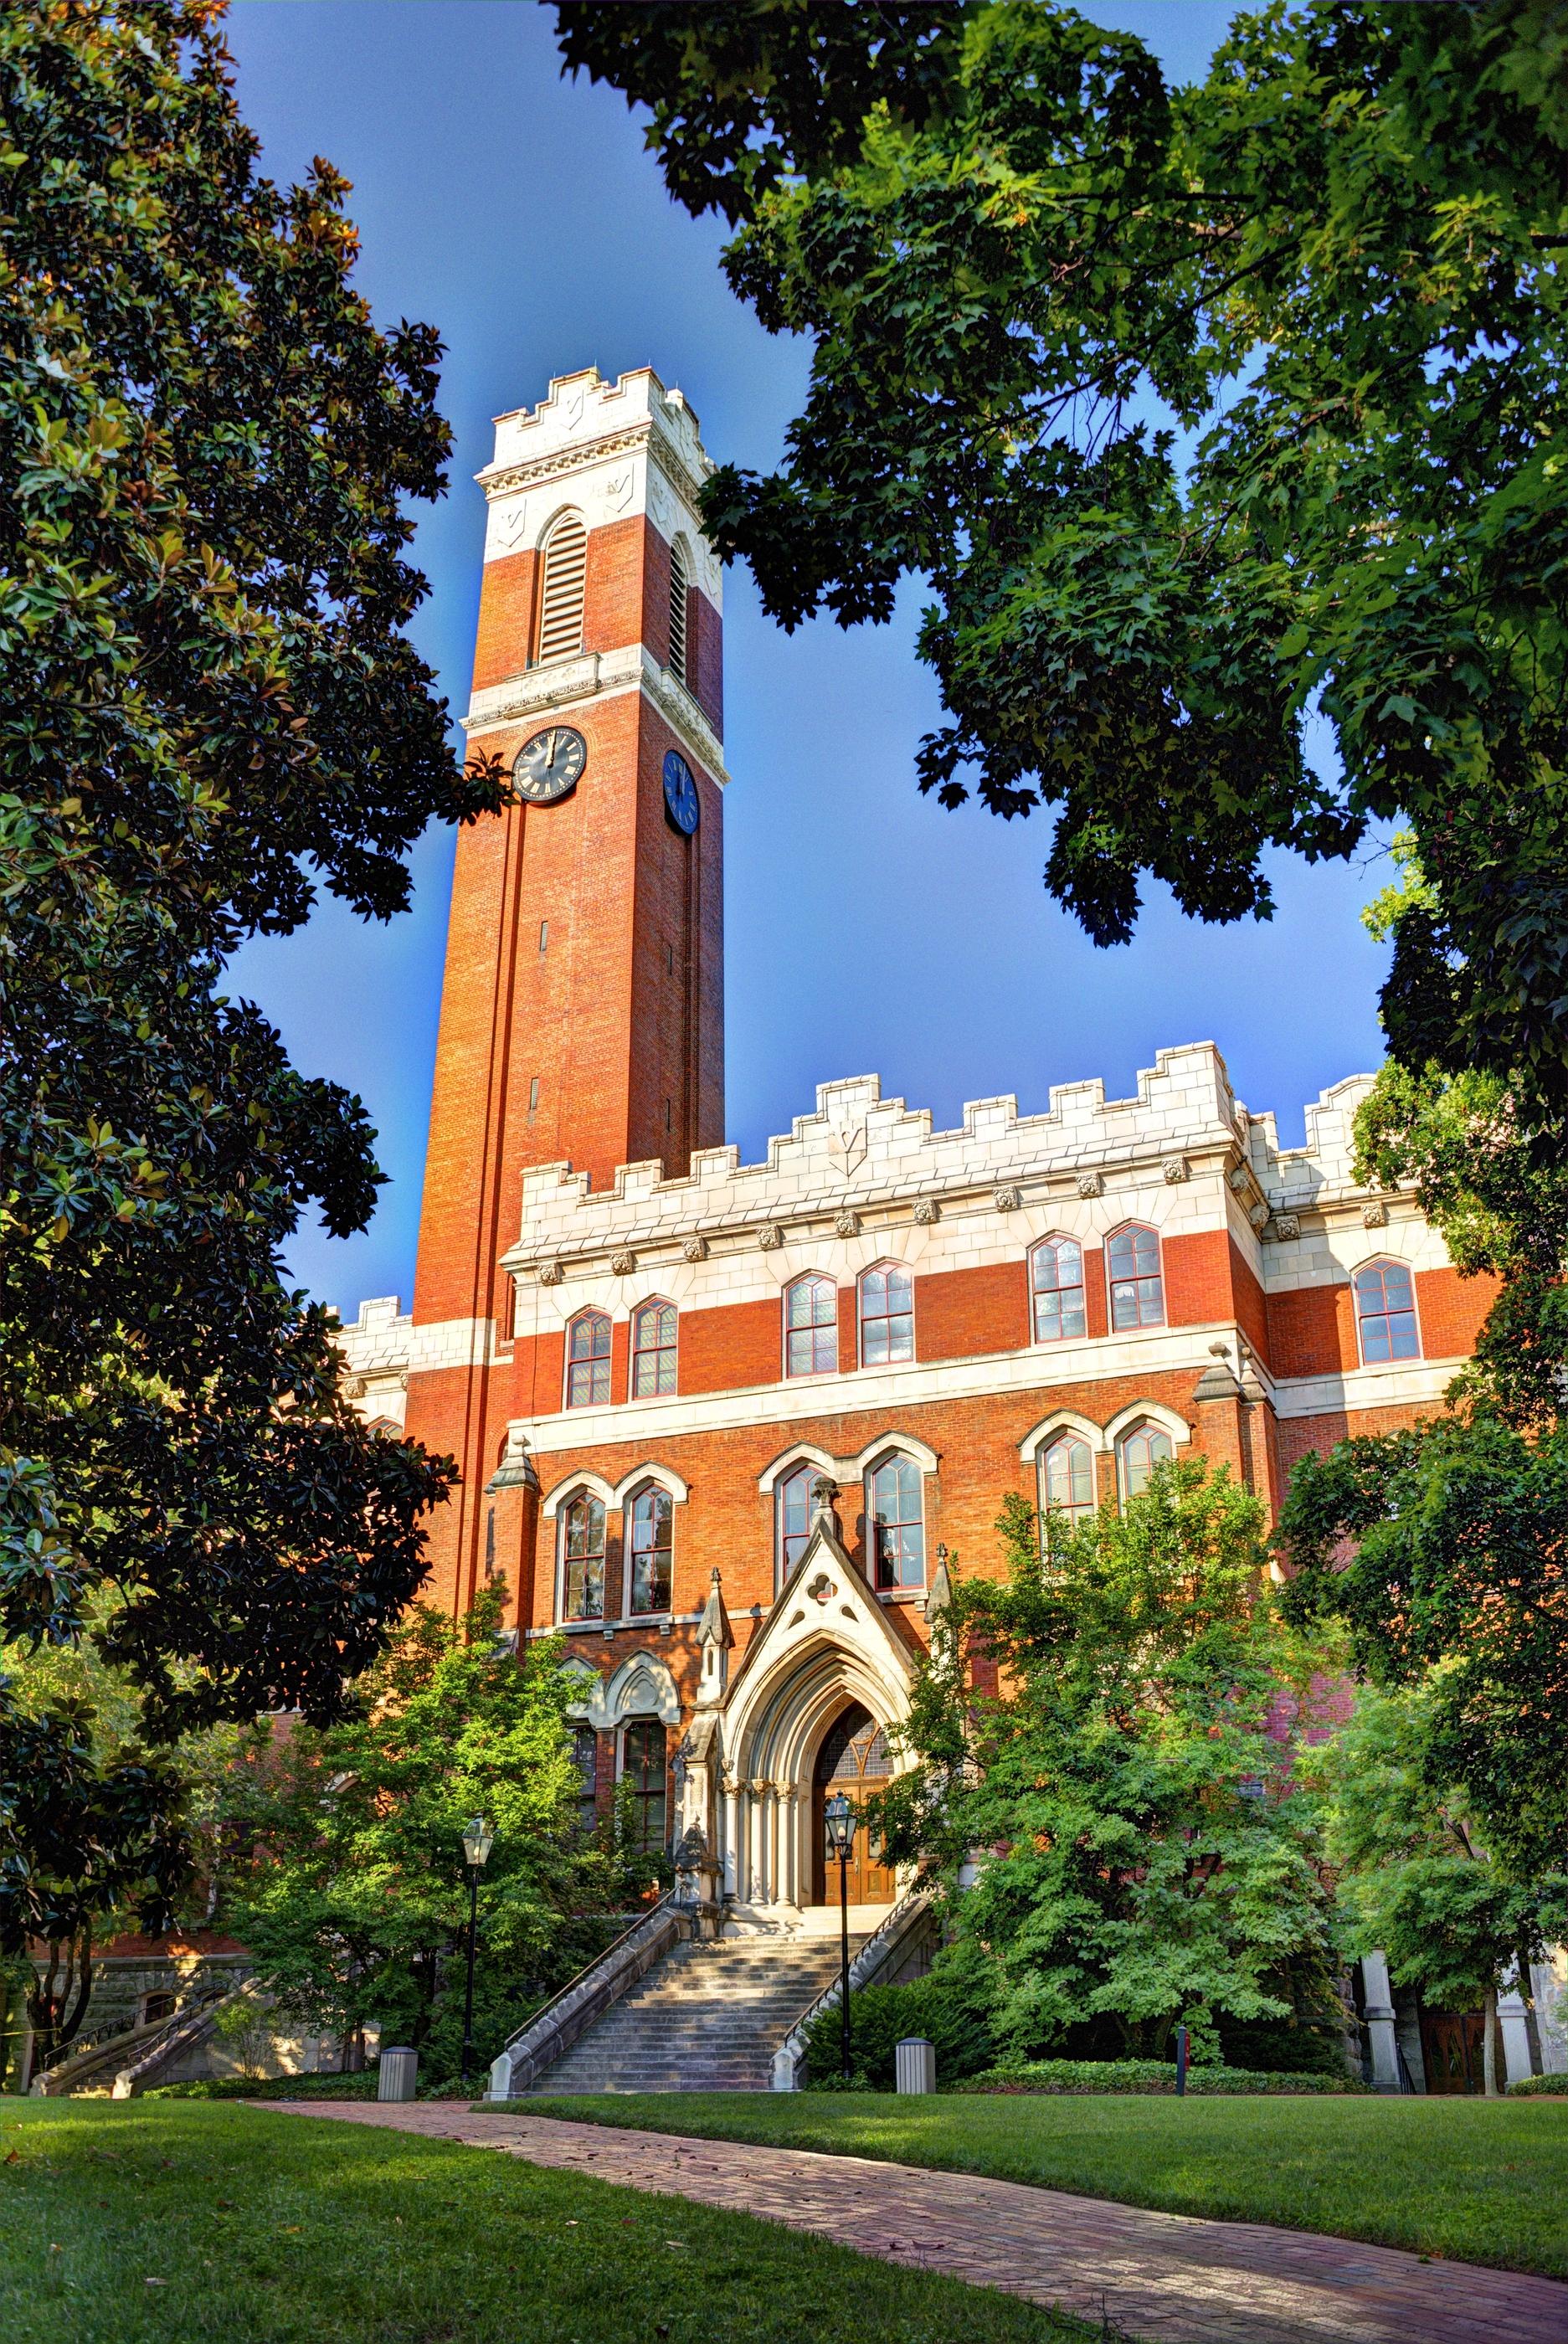 Campus of Vanderbilt University.